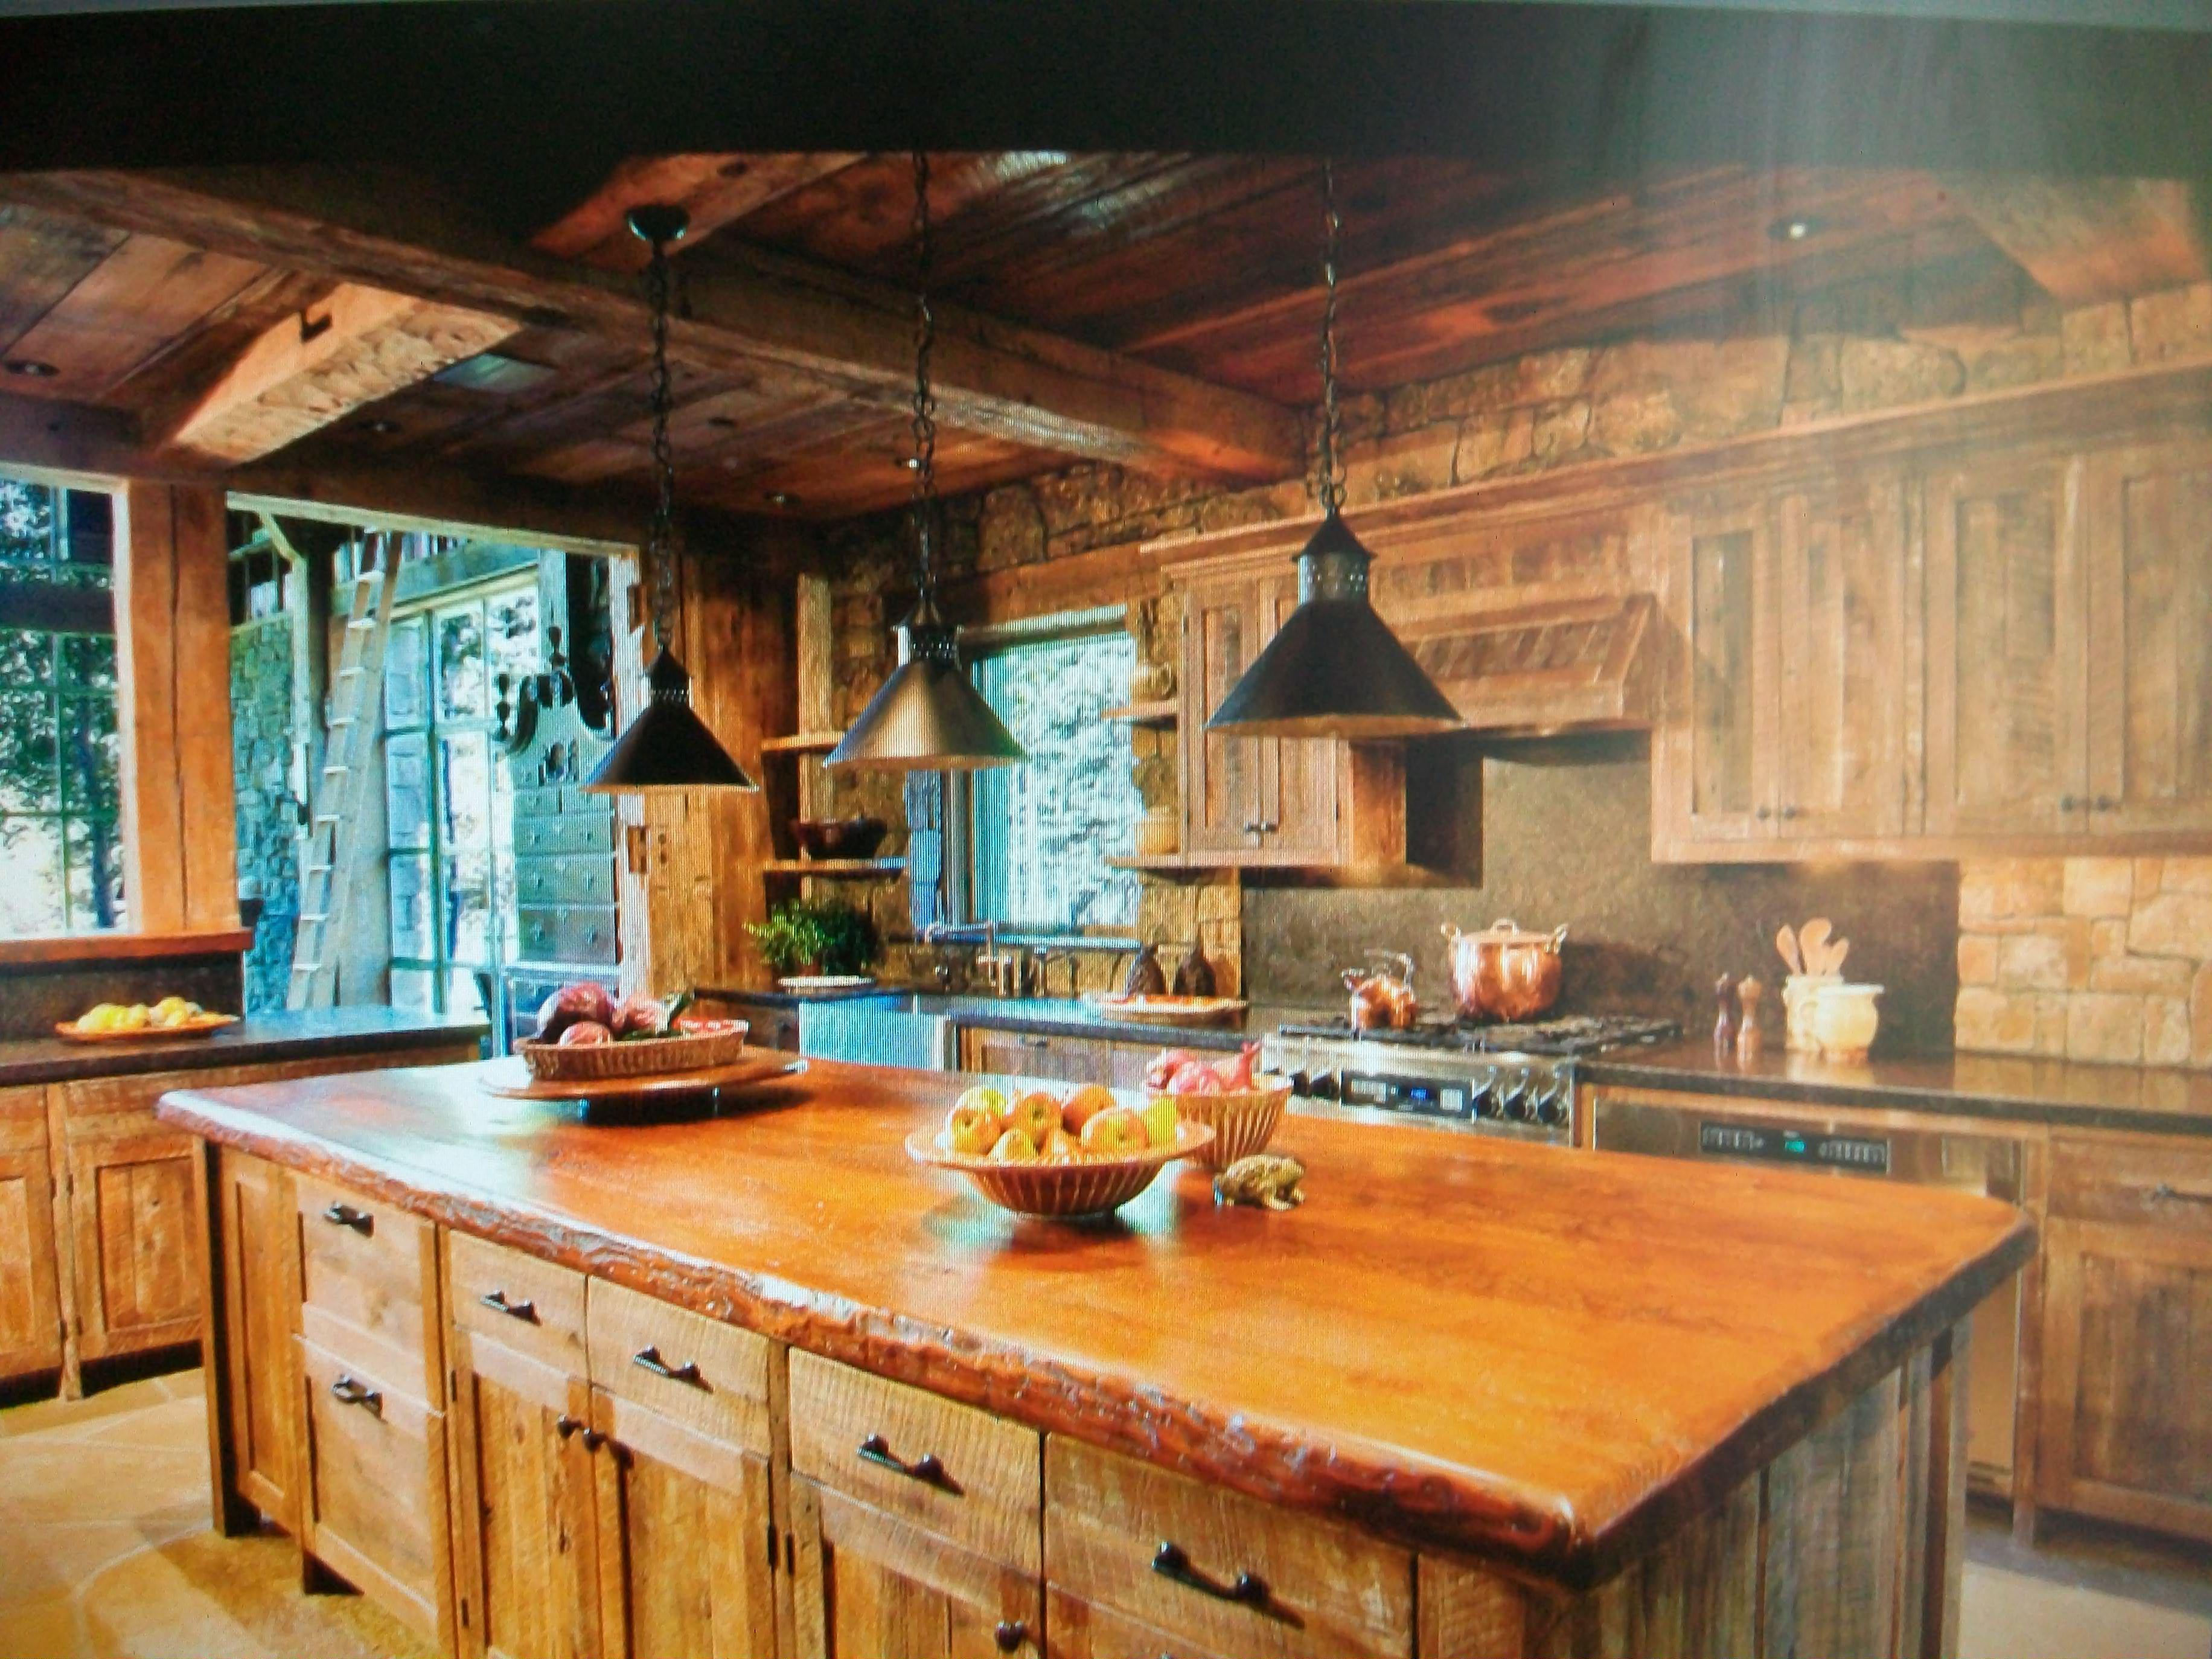 Cabin kitchen cabin ideas pinterest for Cabin kitchen ideas